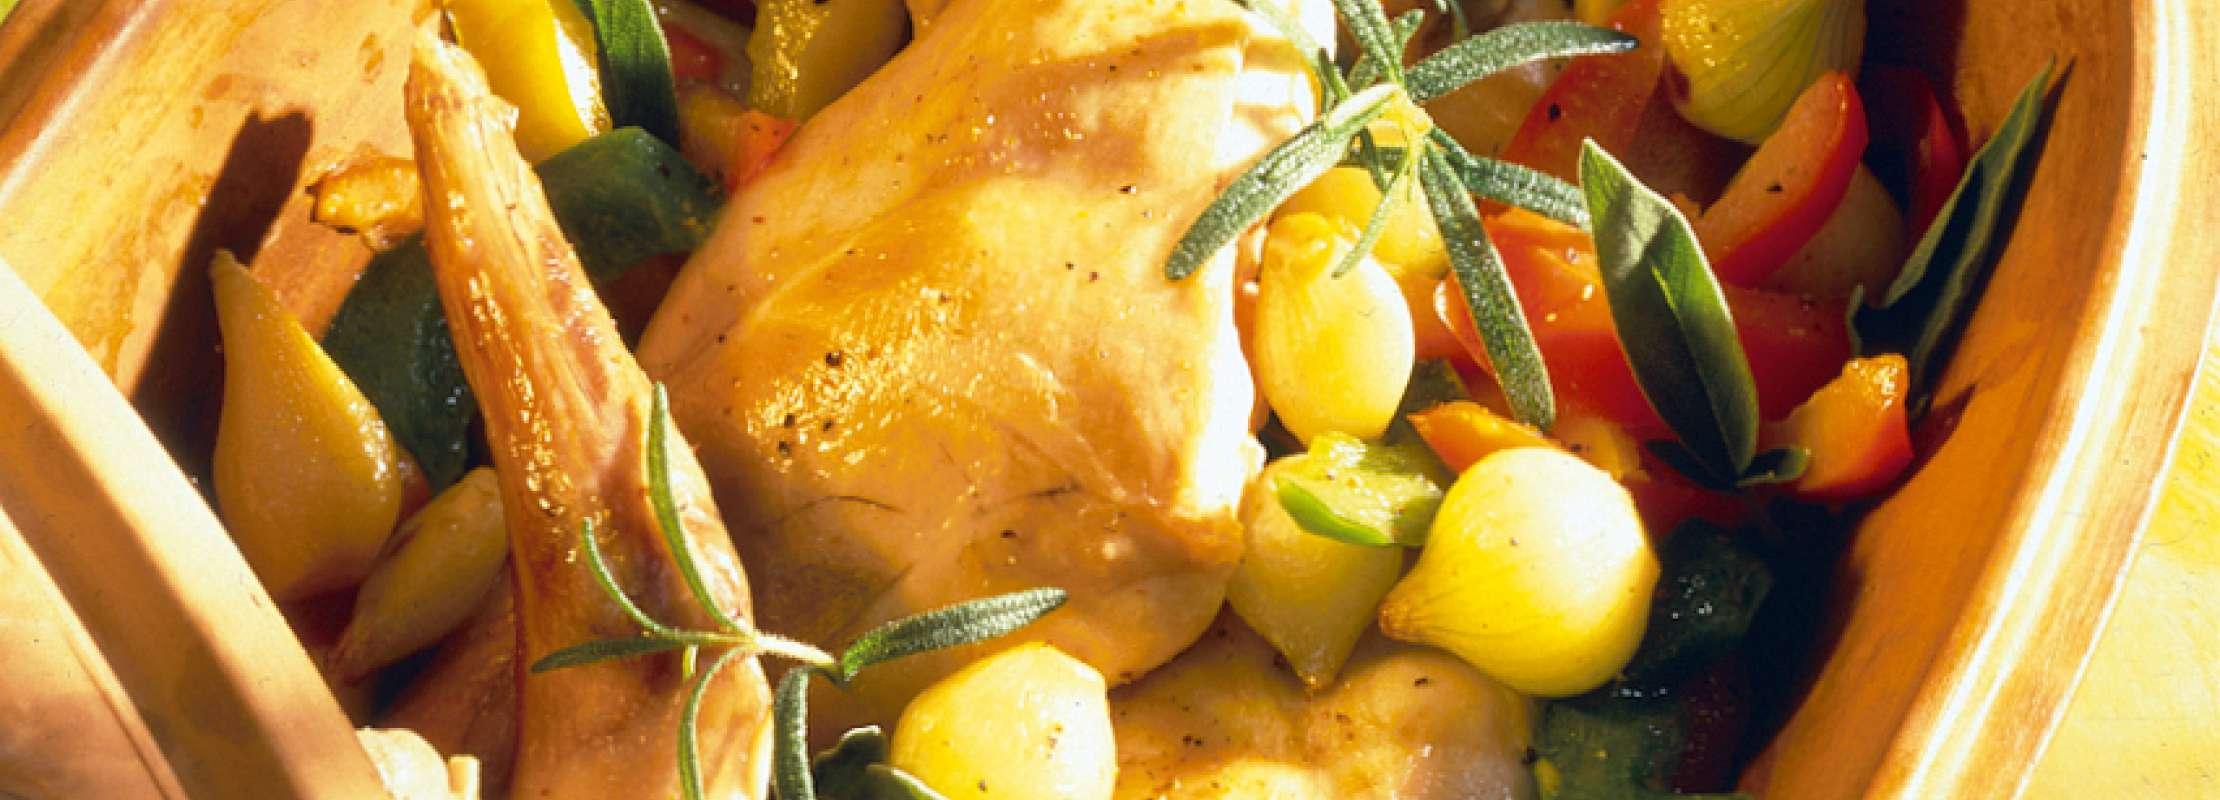 kaninchen mediterrane kuche